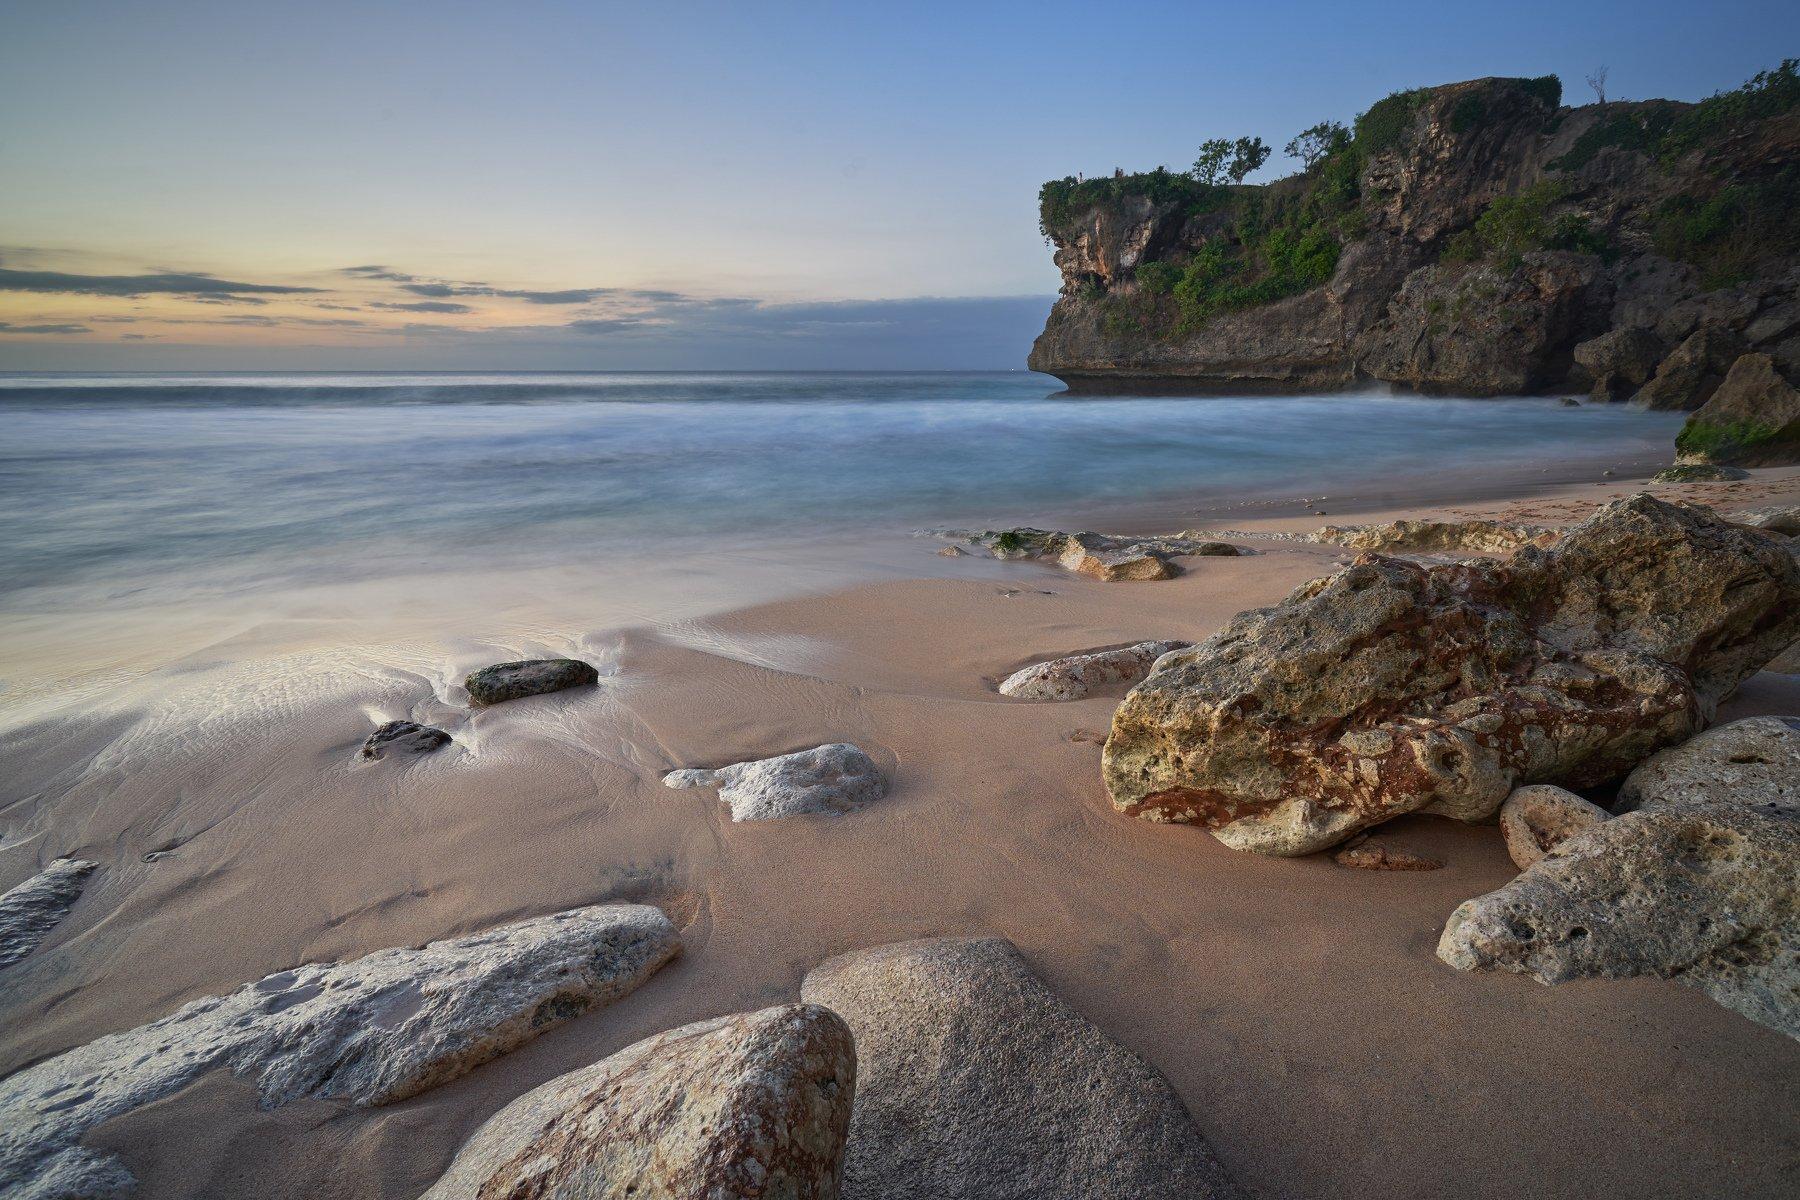 bali, balangan, indonesia, beach, landscape, Бурдов Александр